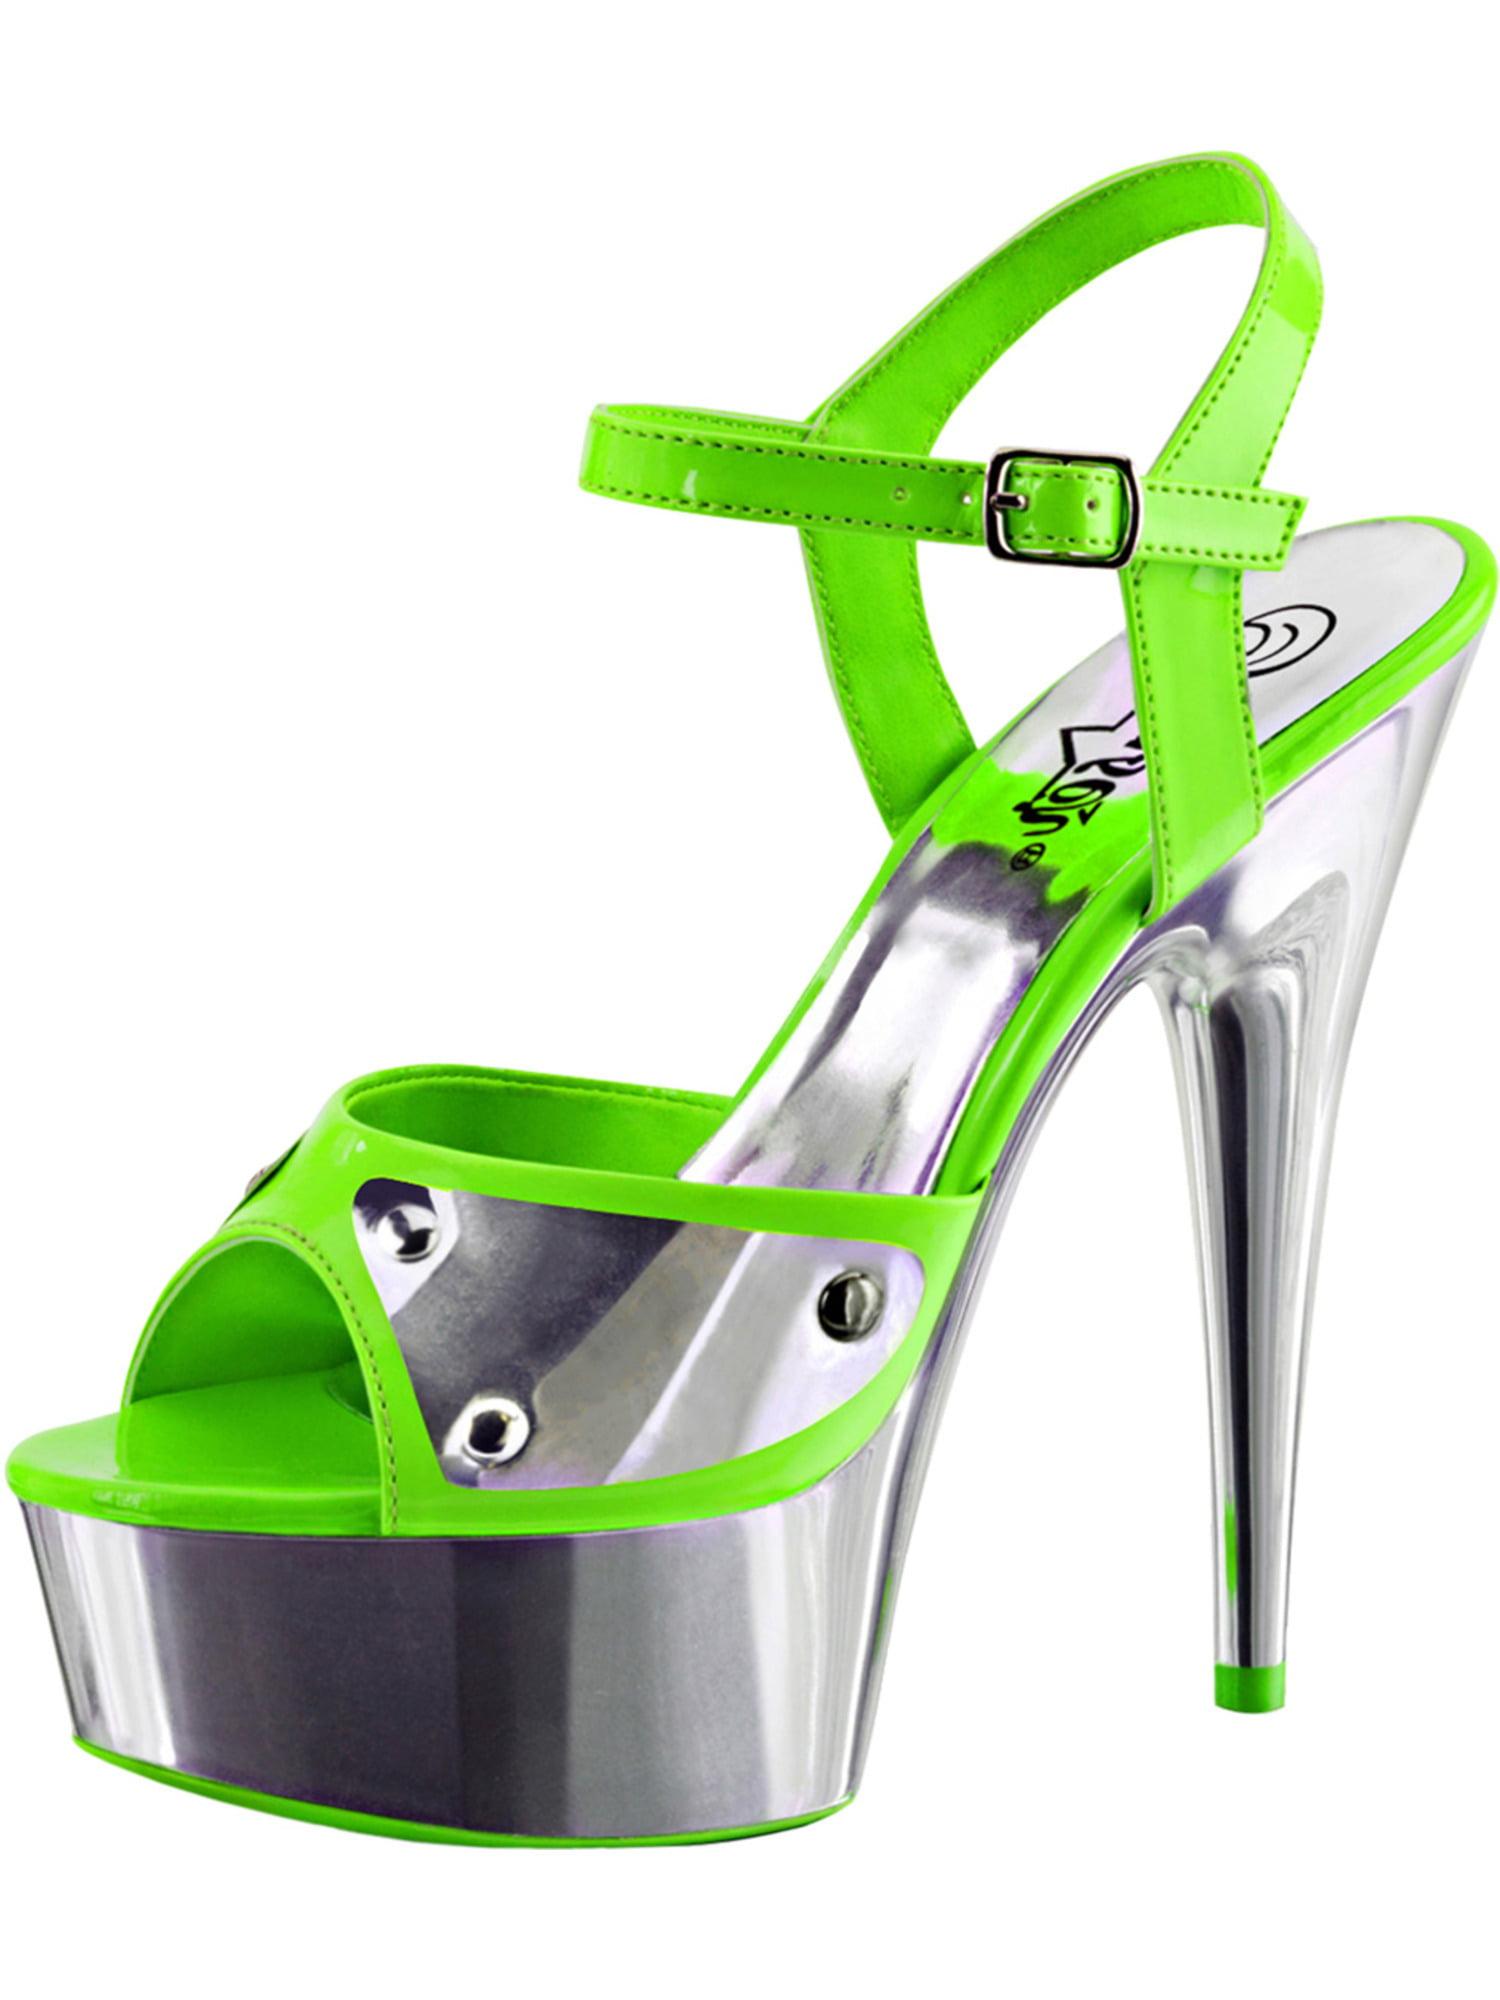 Womens High Heeled 6 Sandals Neon Green Blacklight Platform Sandals 6 Heeled Inch Heels bbf8a1